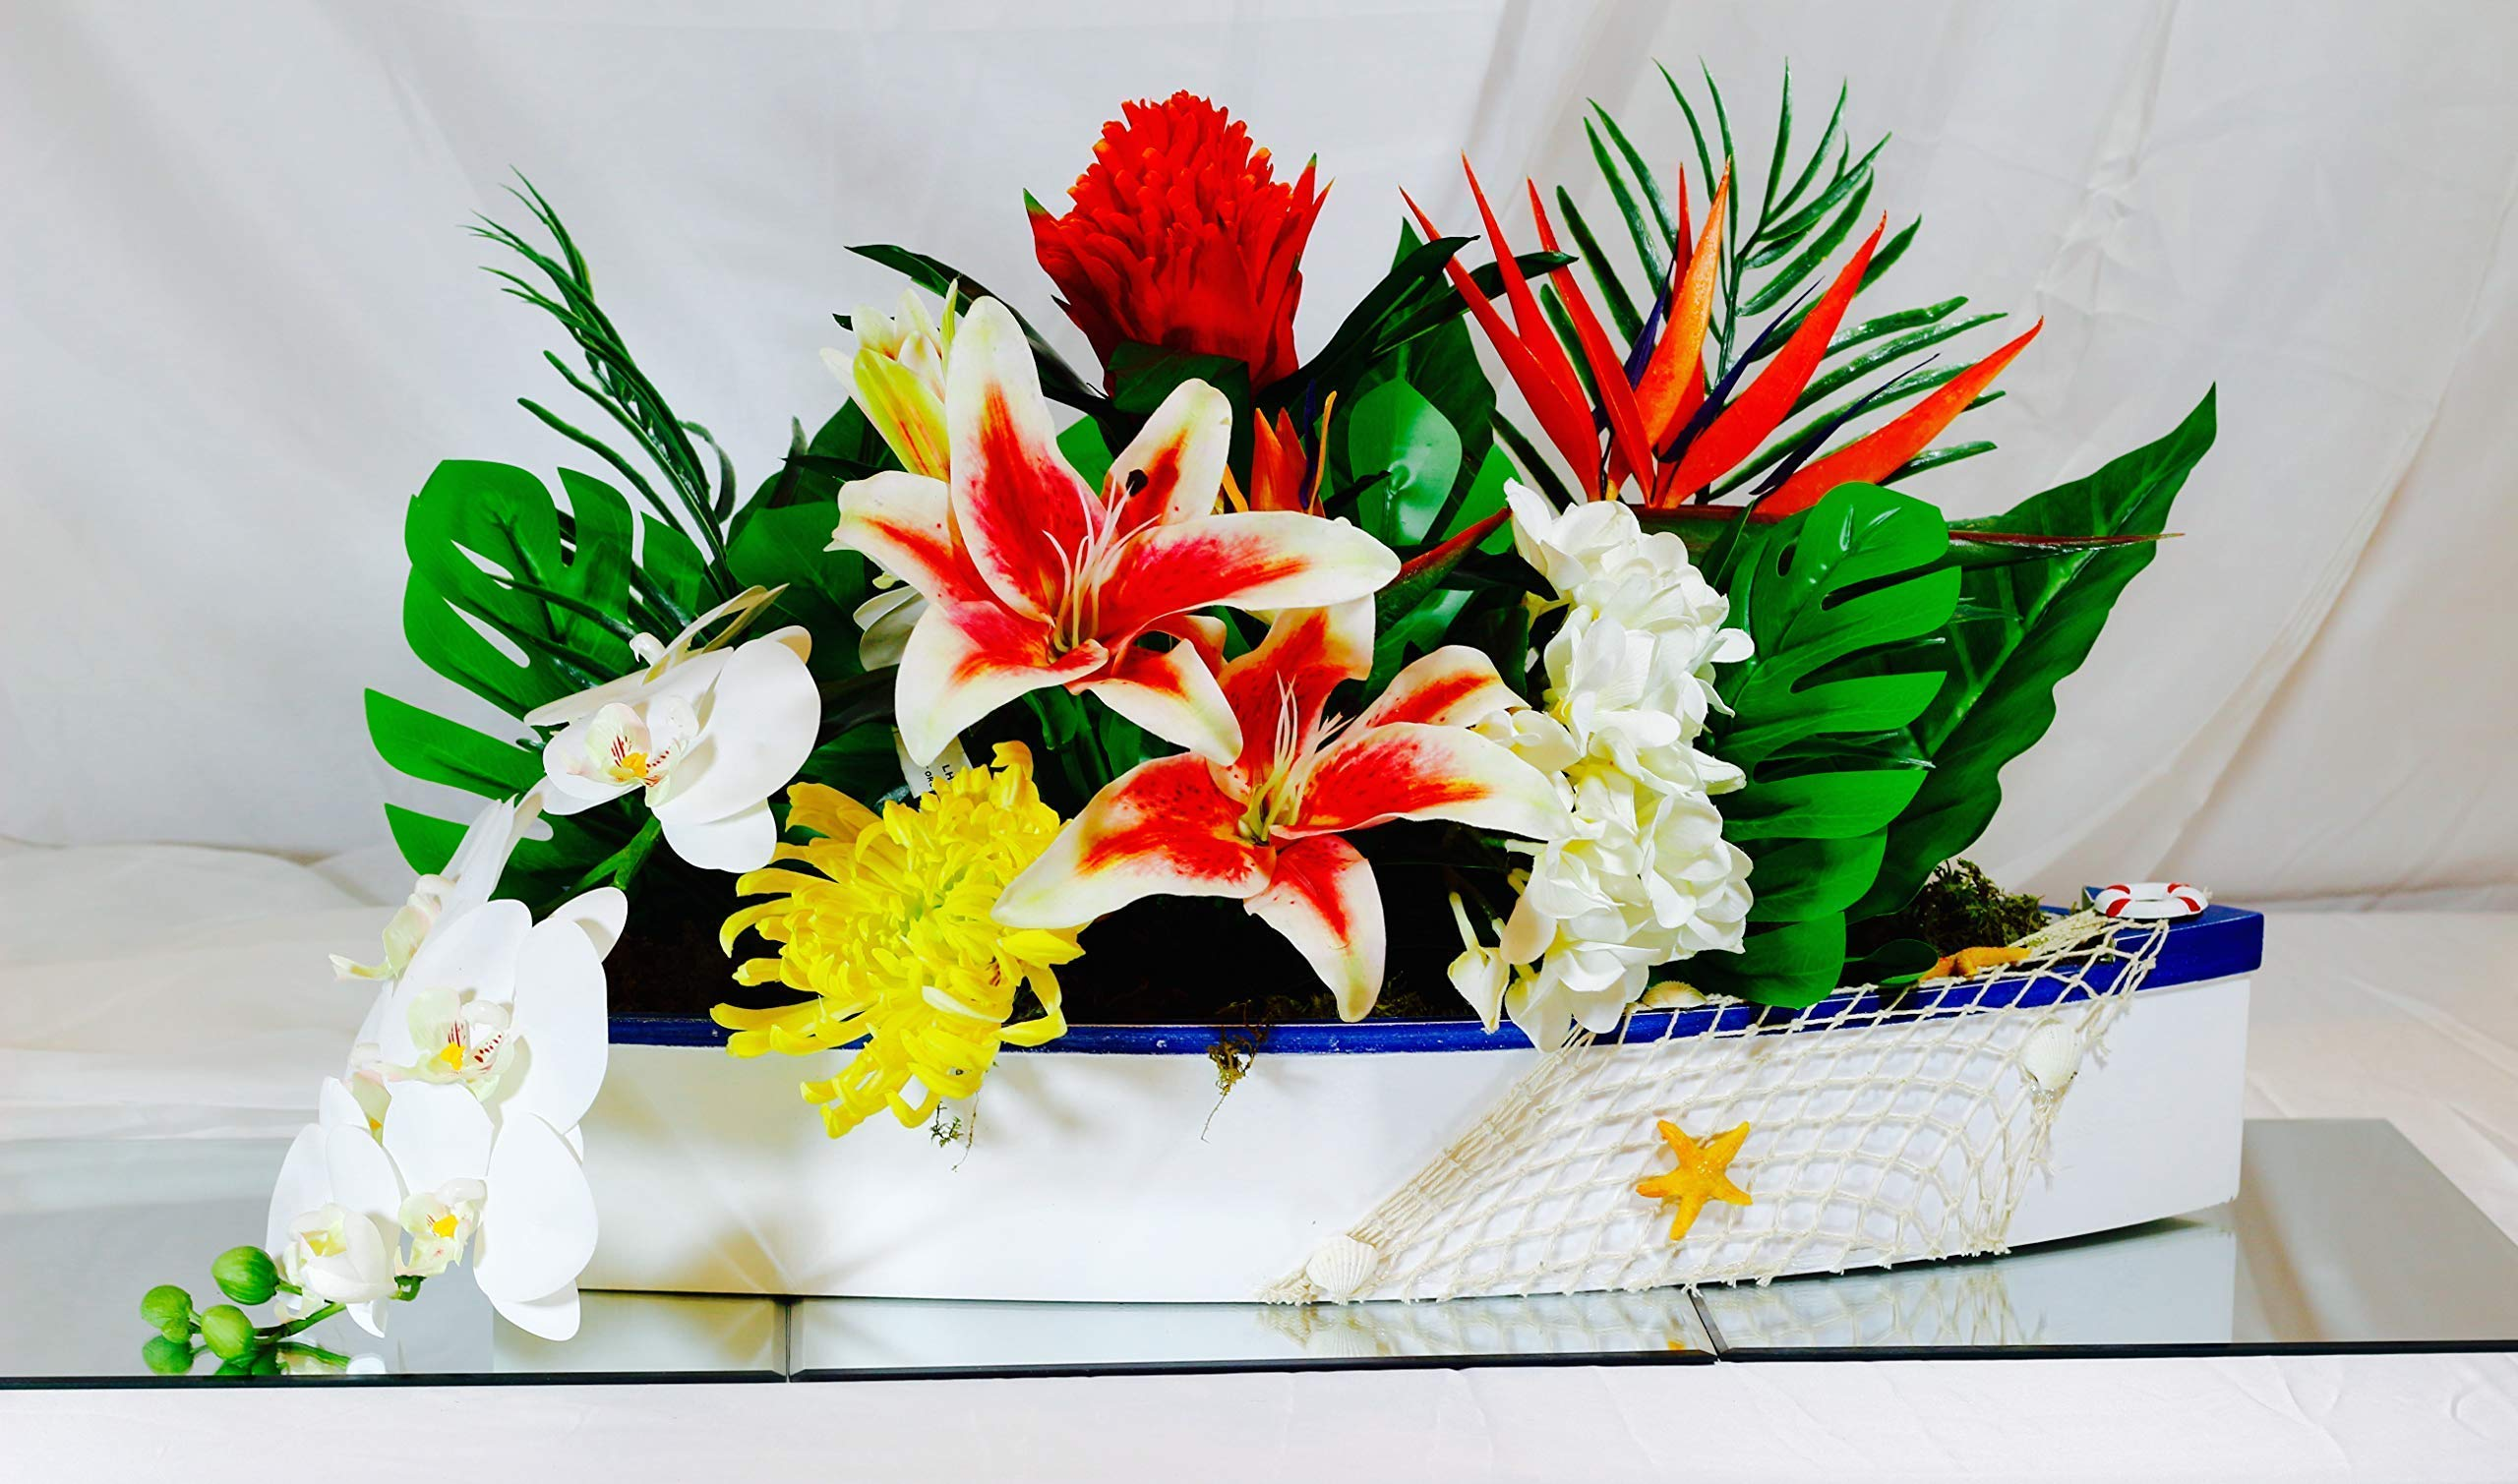 silk flower arrangements wsklinft artificial flower bird of paradise fake plant silk strelitzia reginae home decor - orange